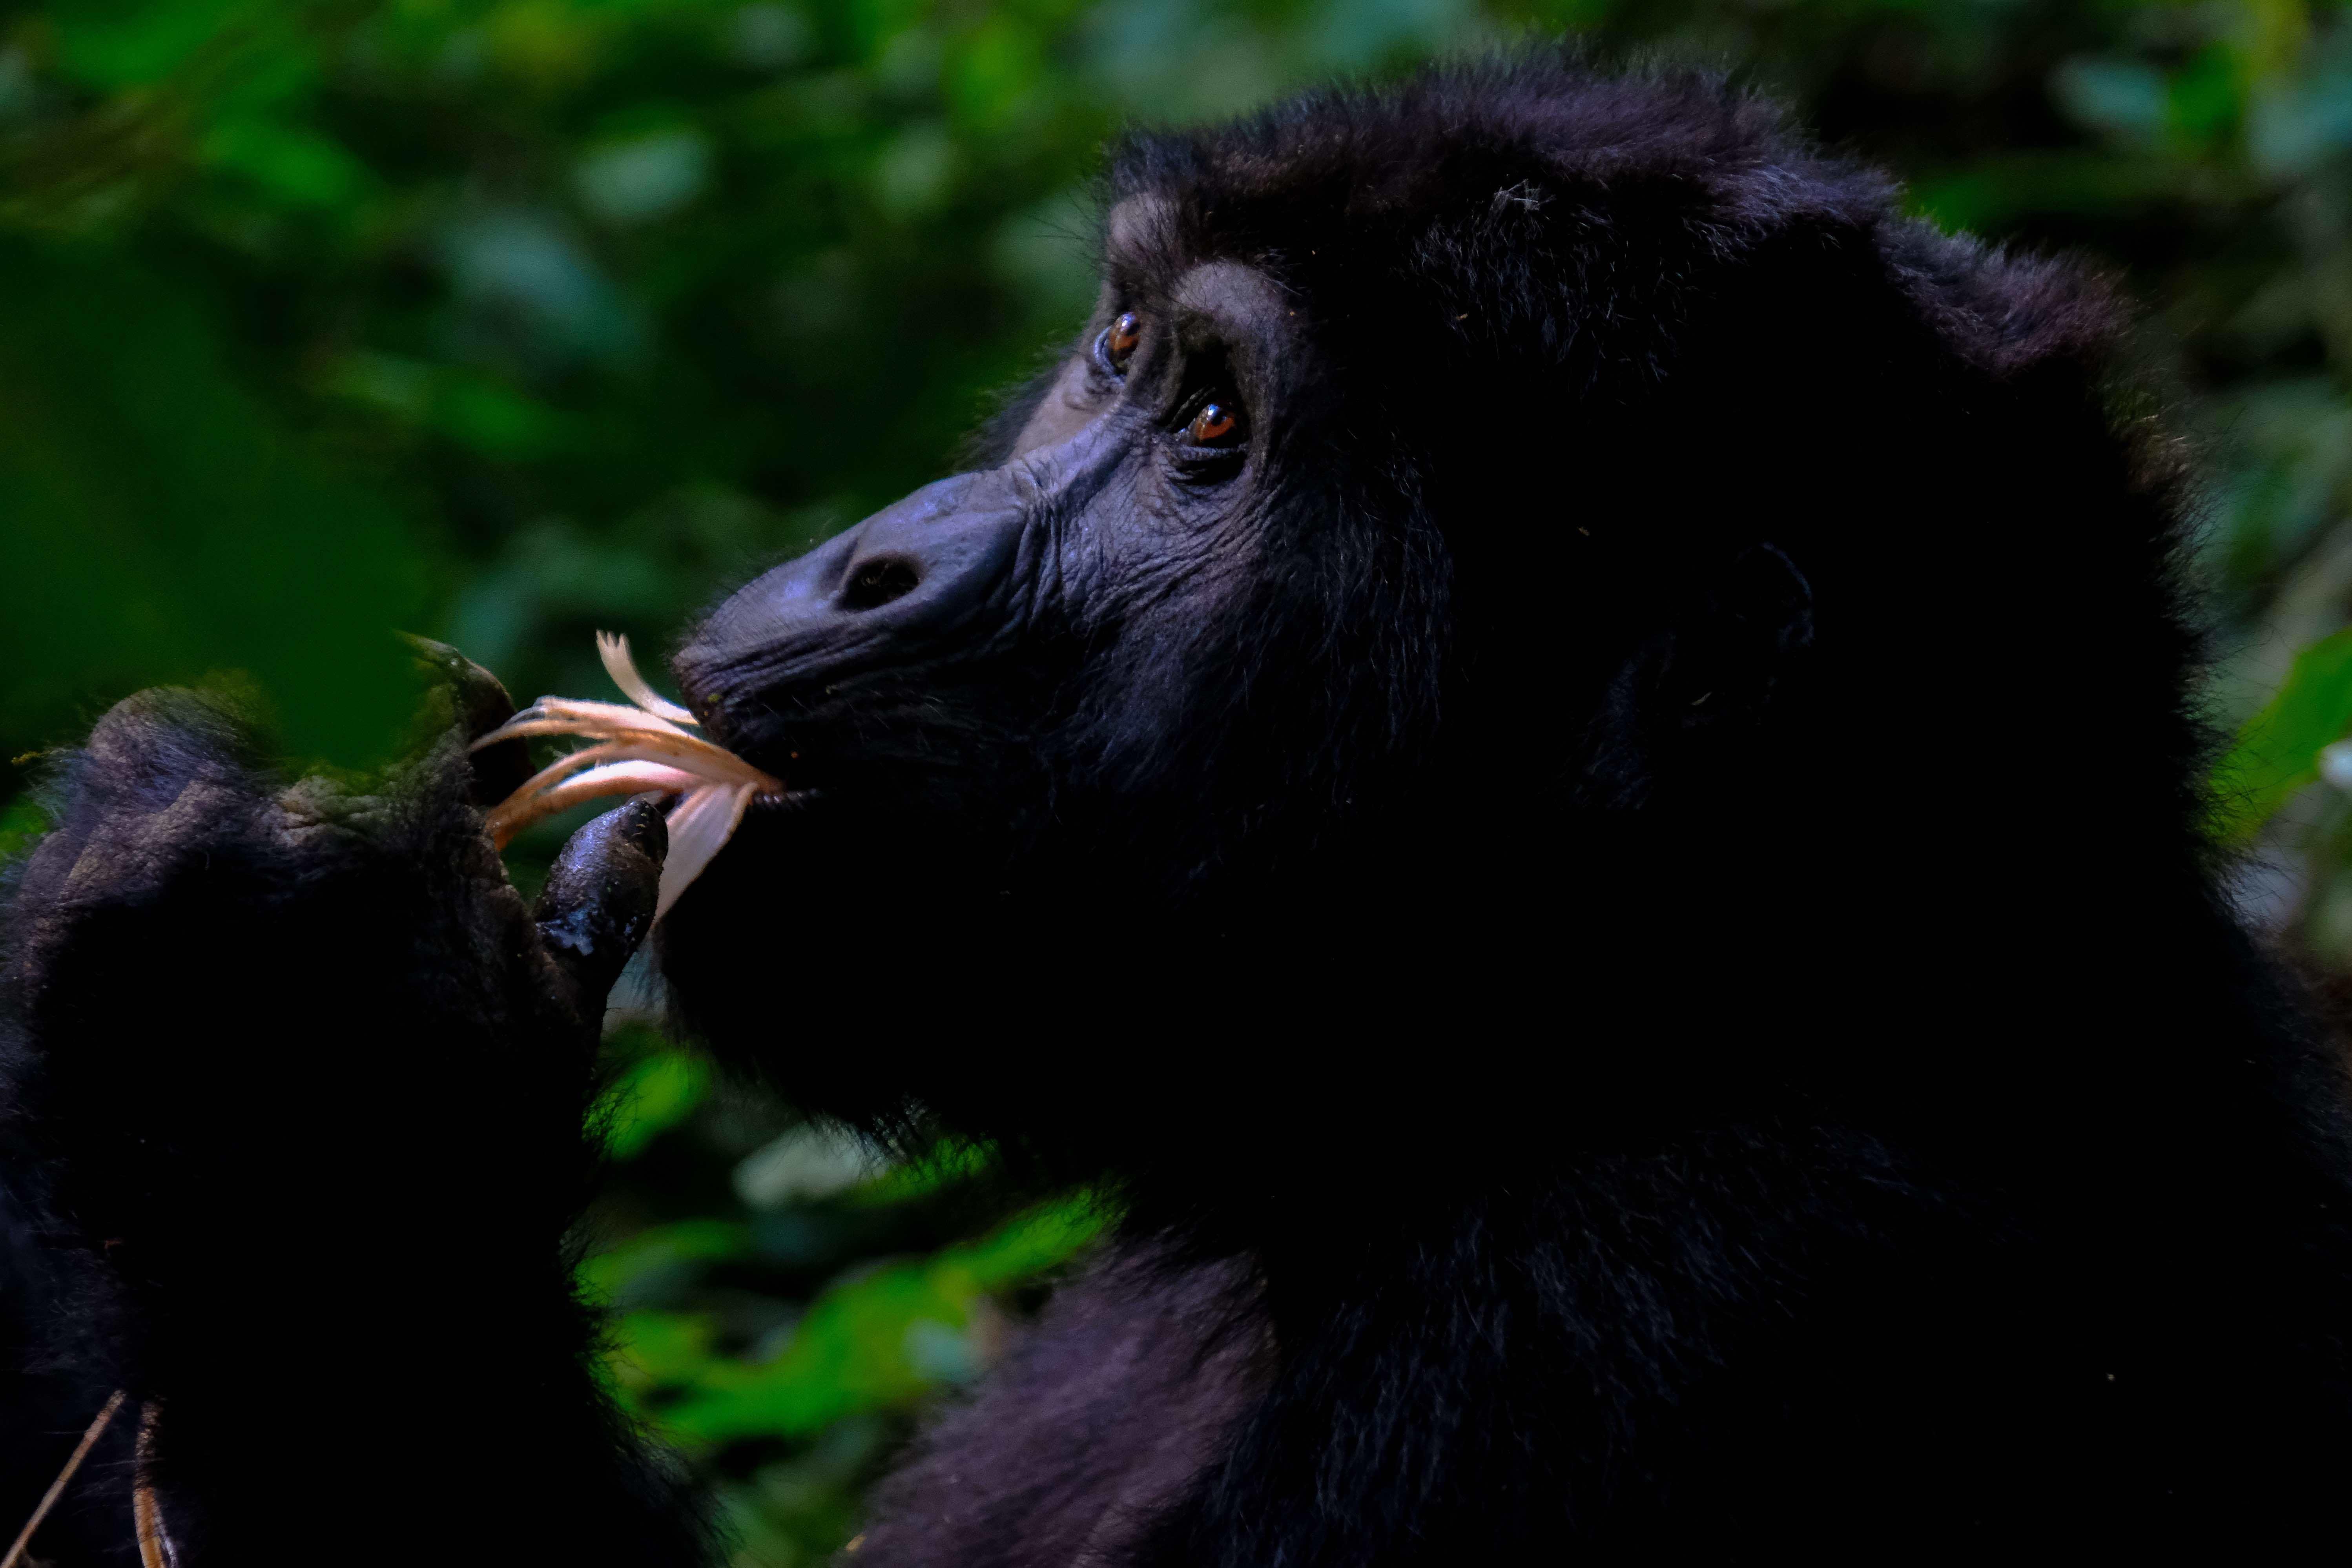 gorilla imagery